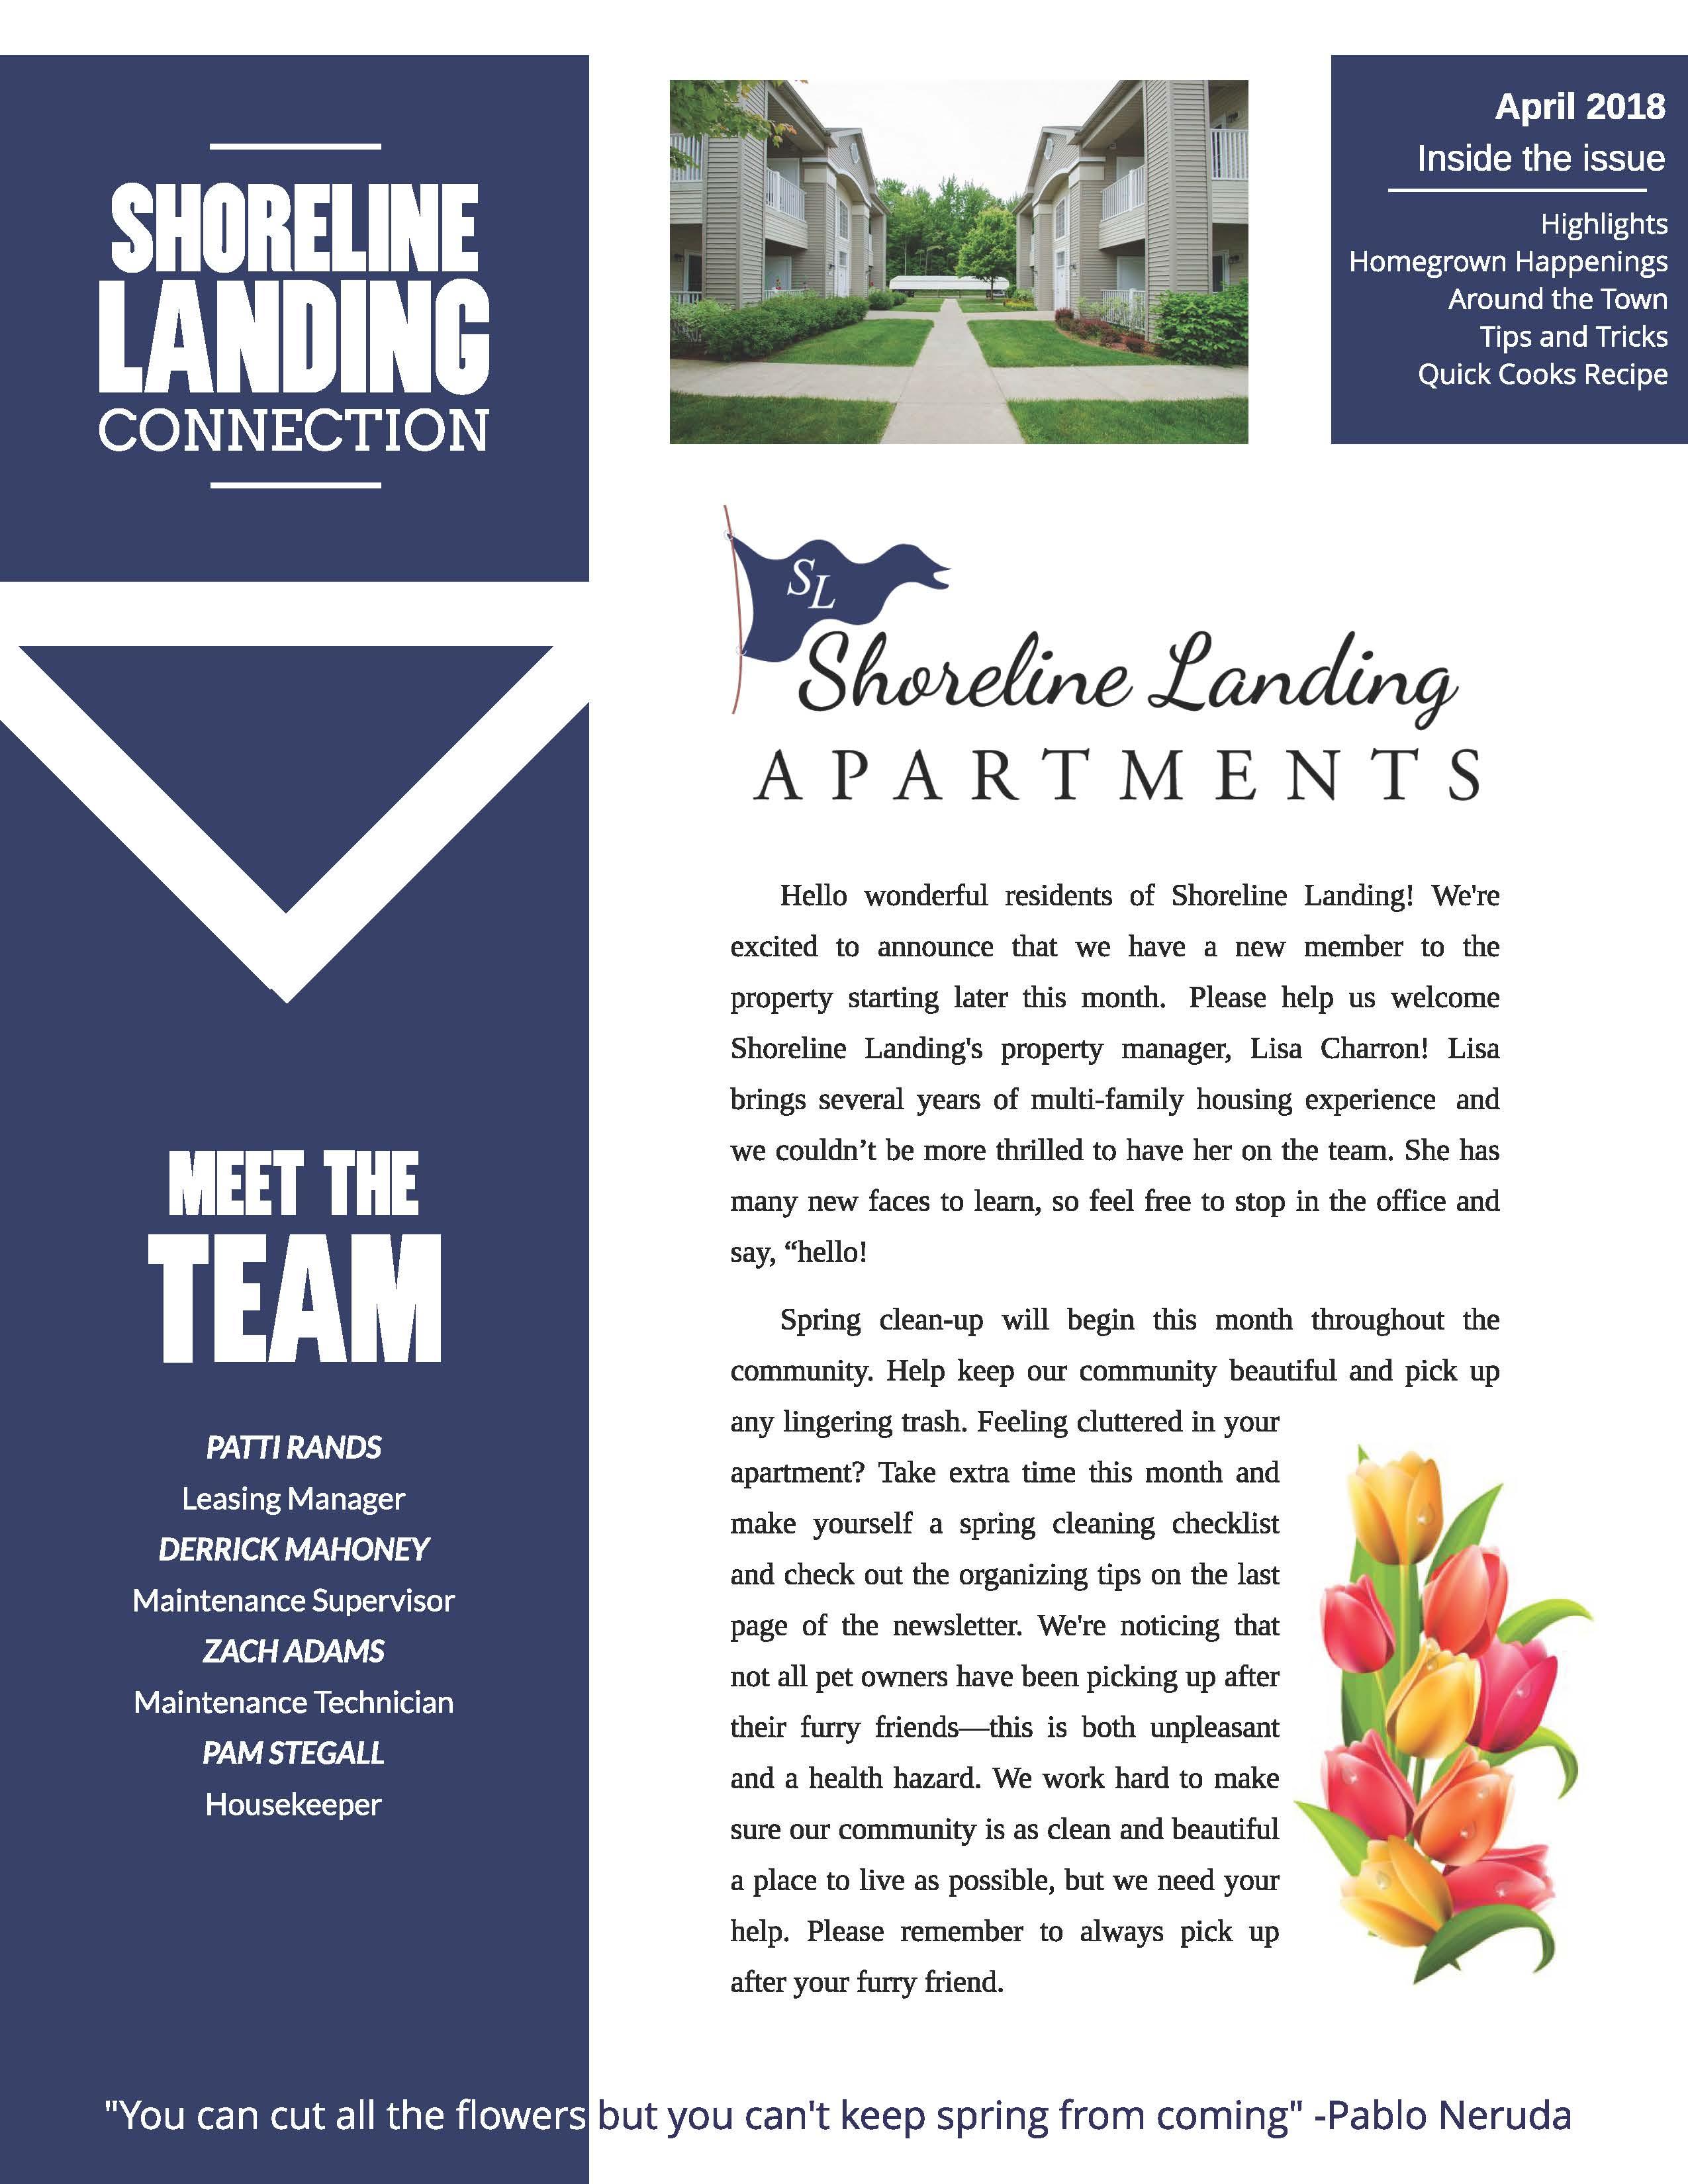 ad12431d06f4 April 2018 Edition Newsletter: Shoreline Landing Connection